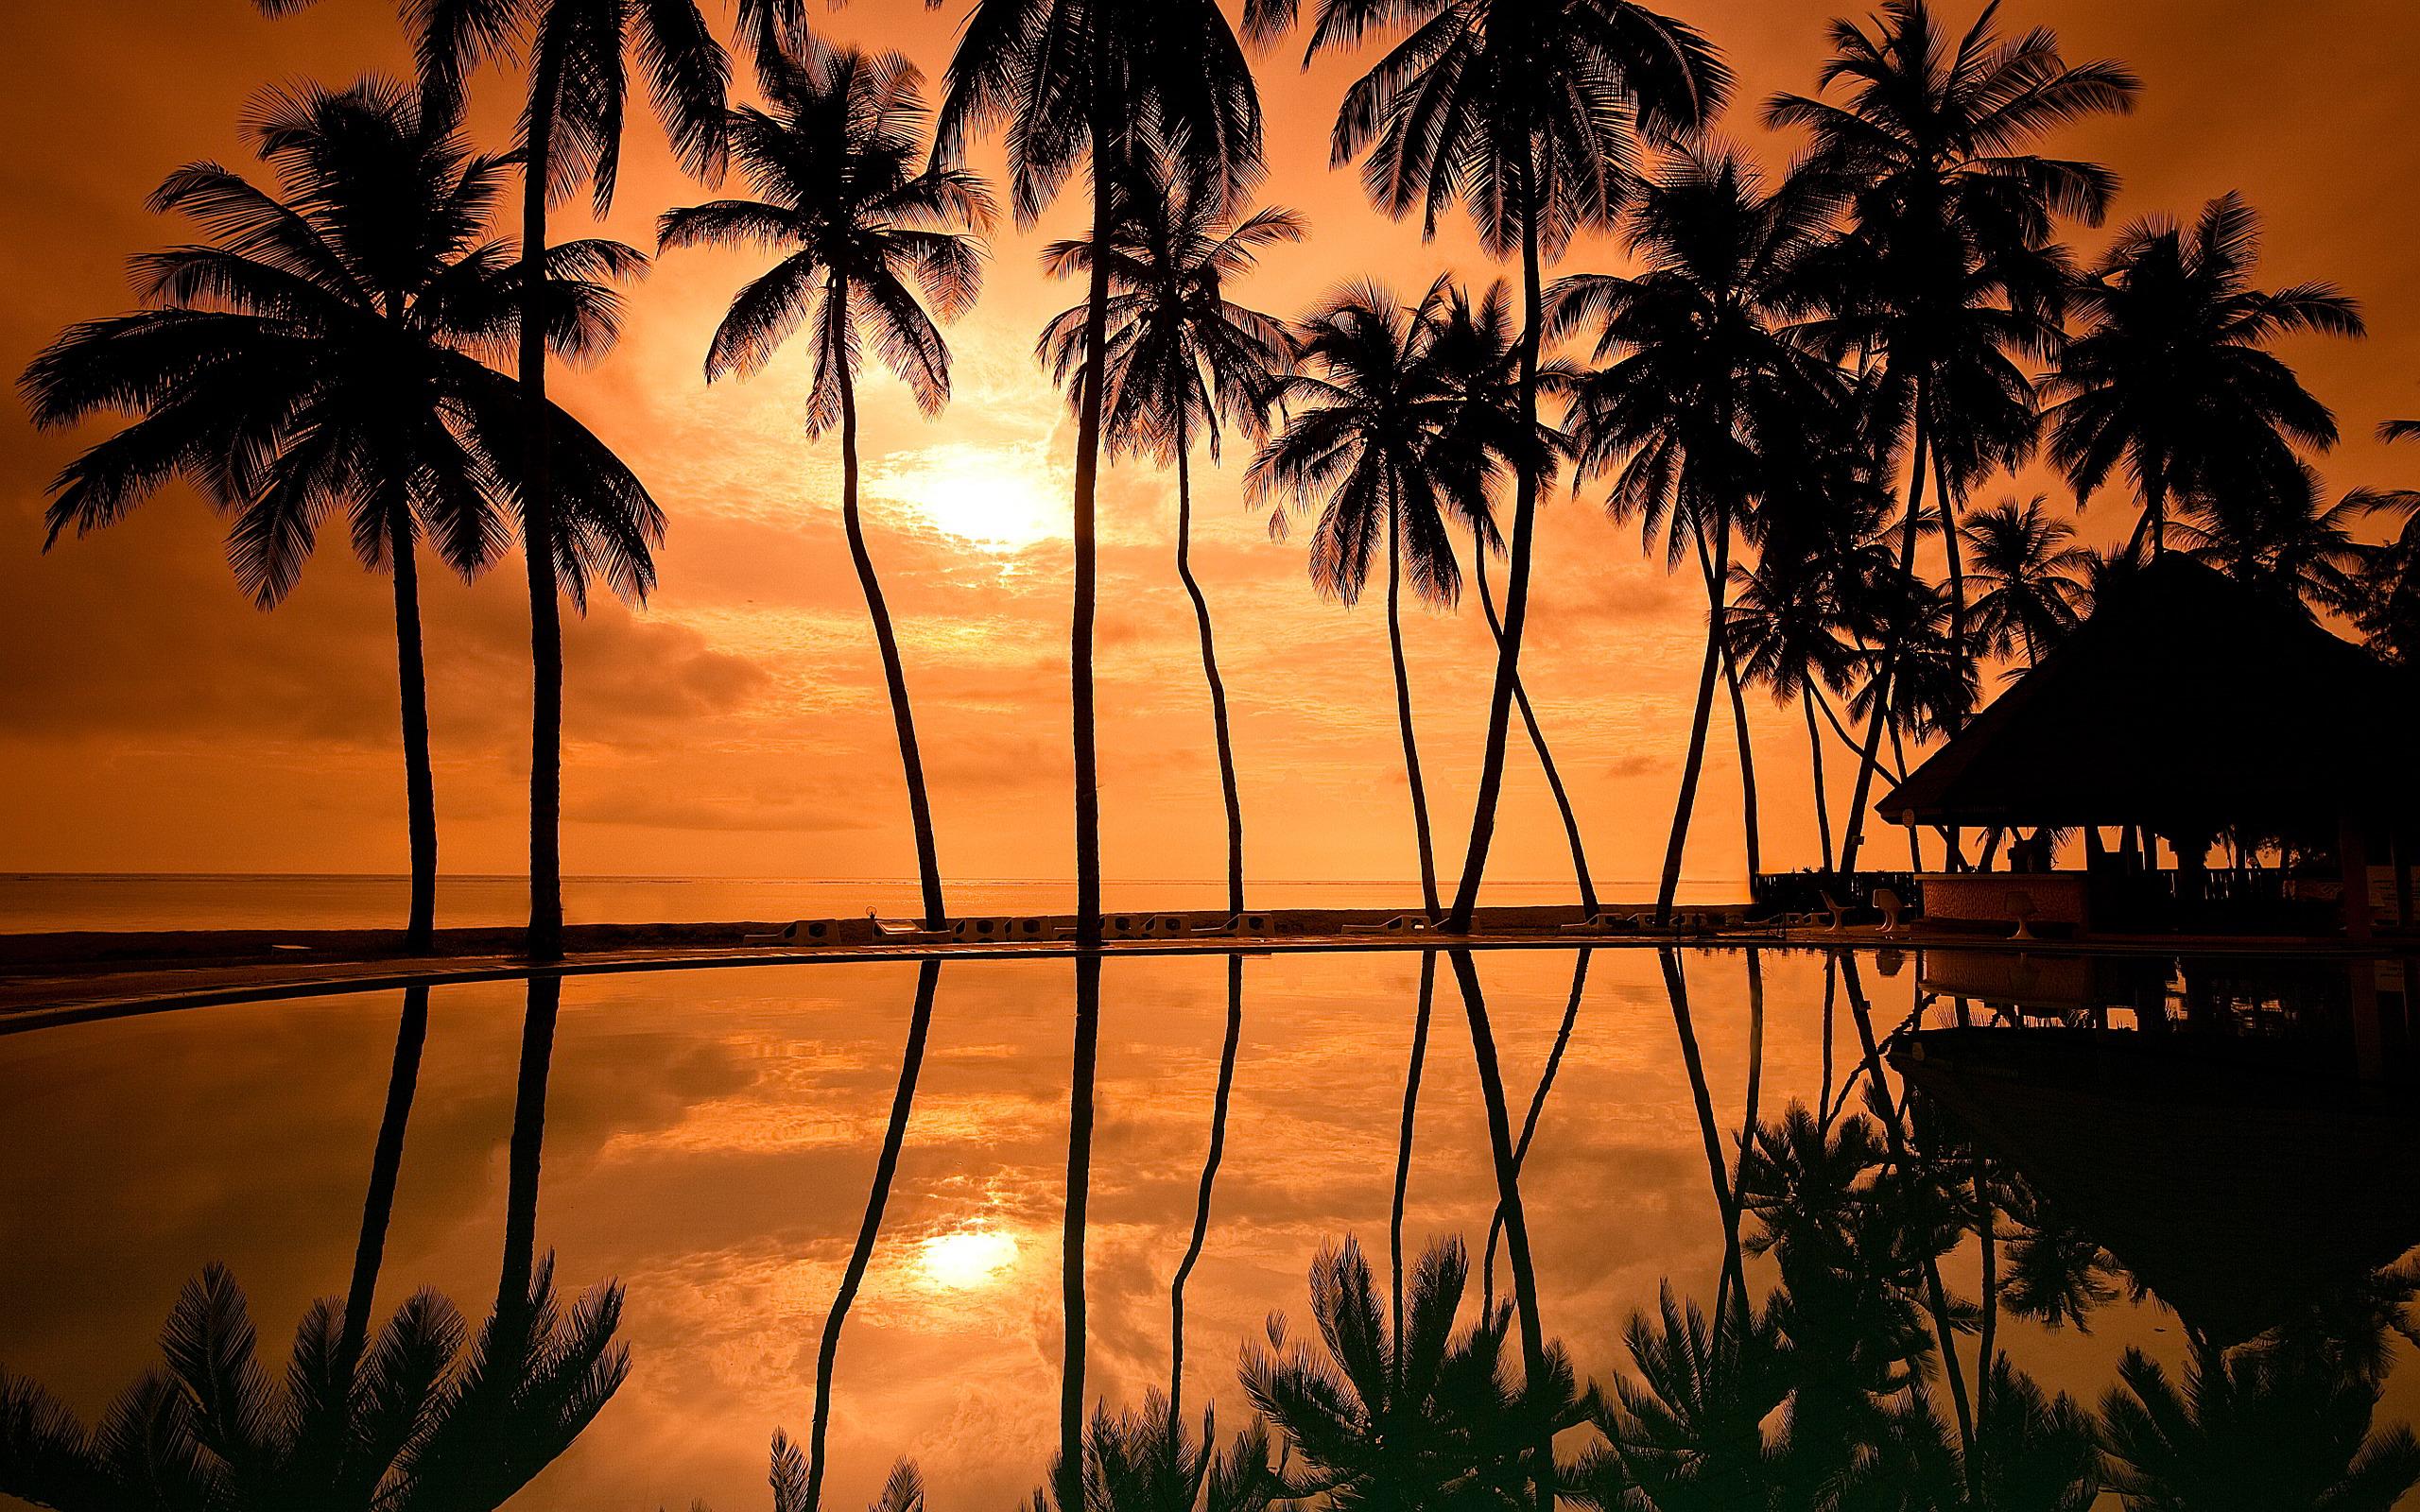 sunset photos hawaii beach